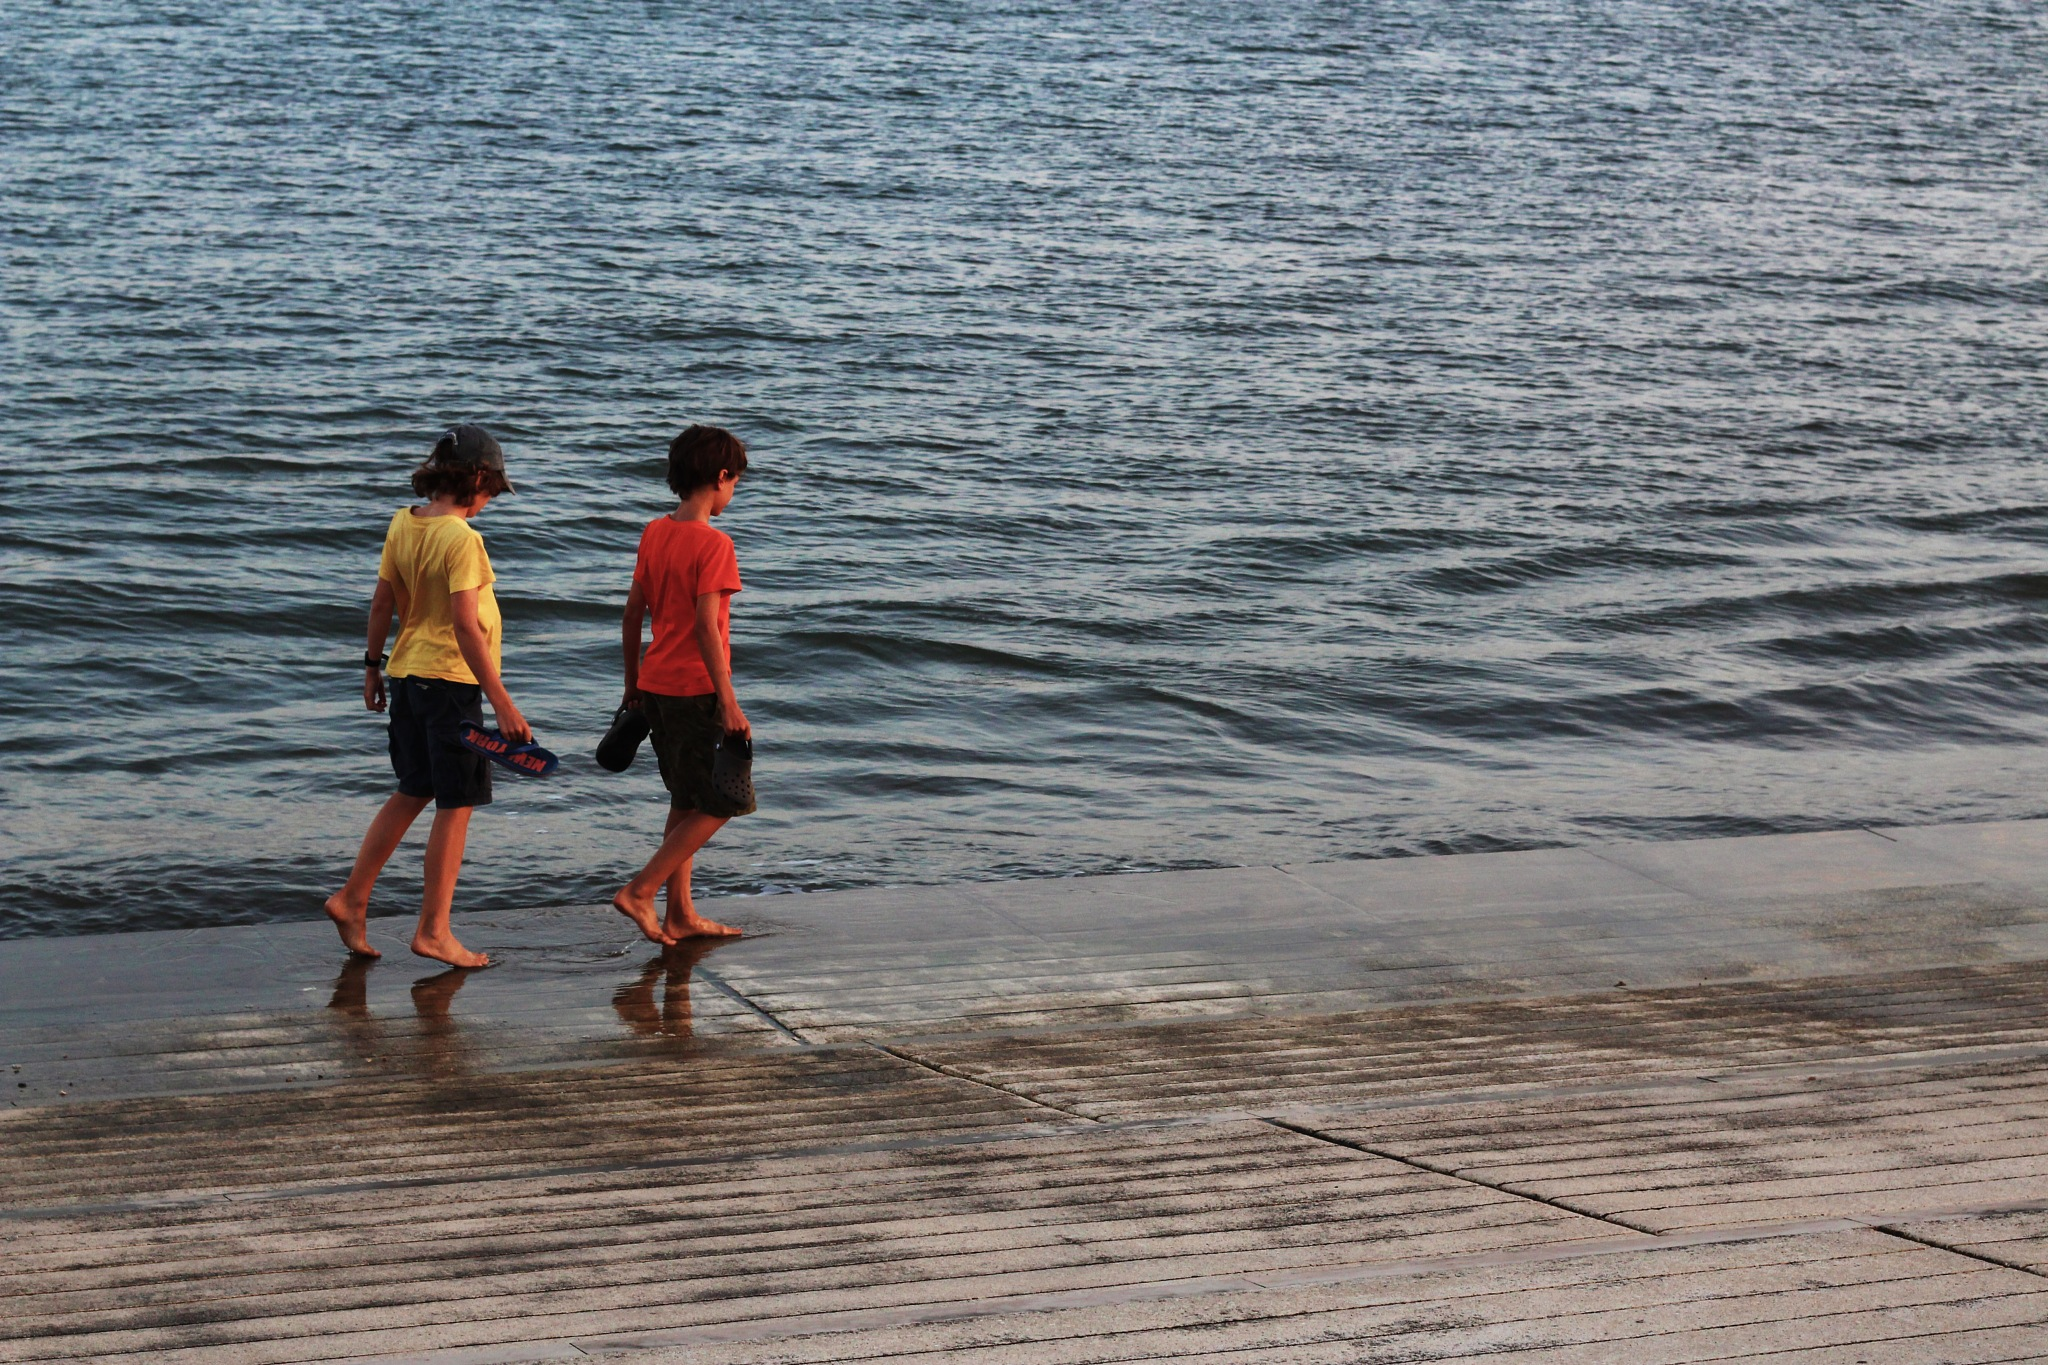 Children @ Tejo River, Lx by carlosmsantos